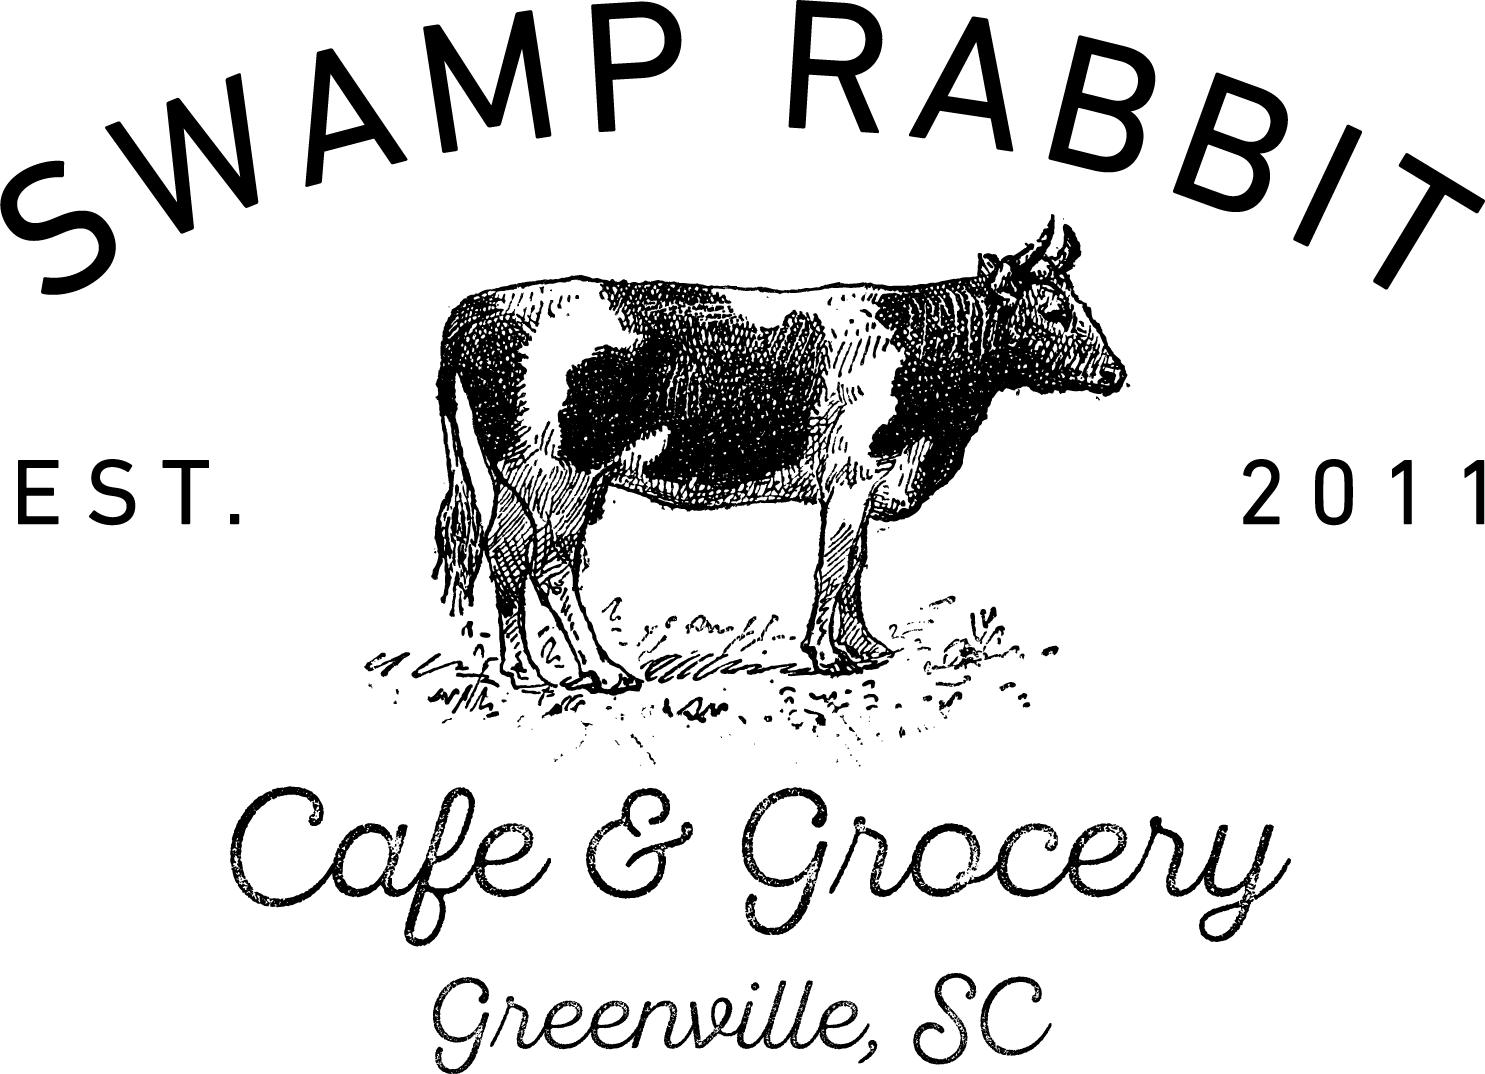 Swamp Rabbit Cafe & Grocery